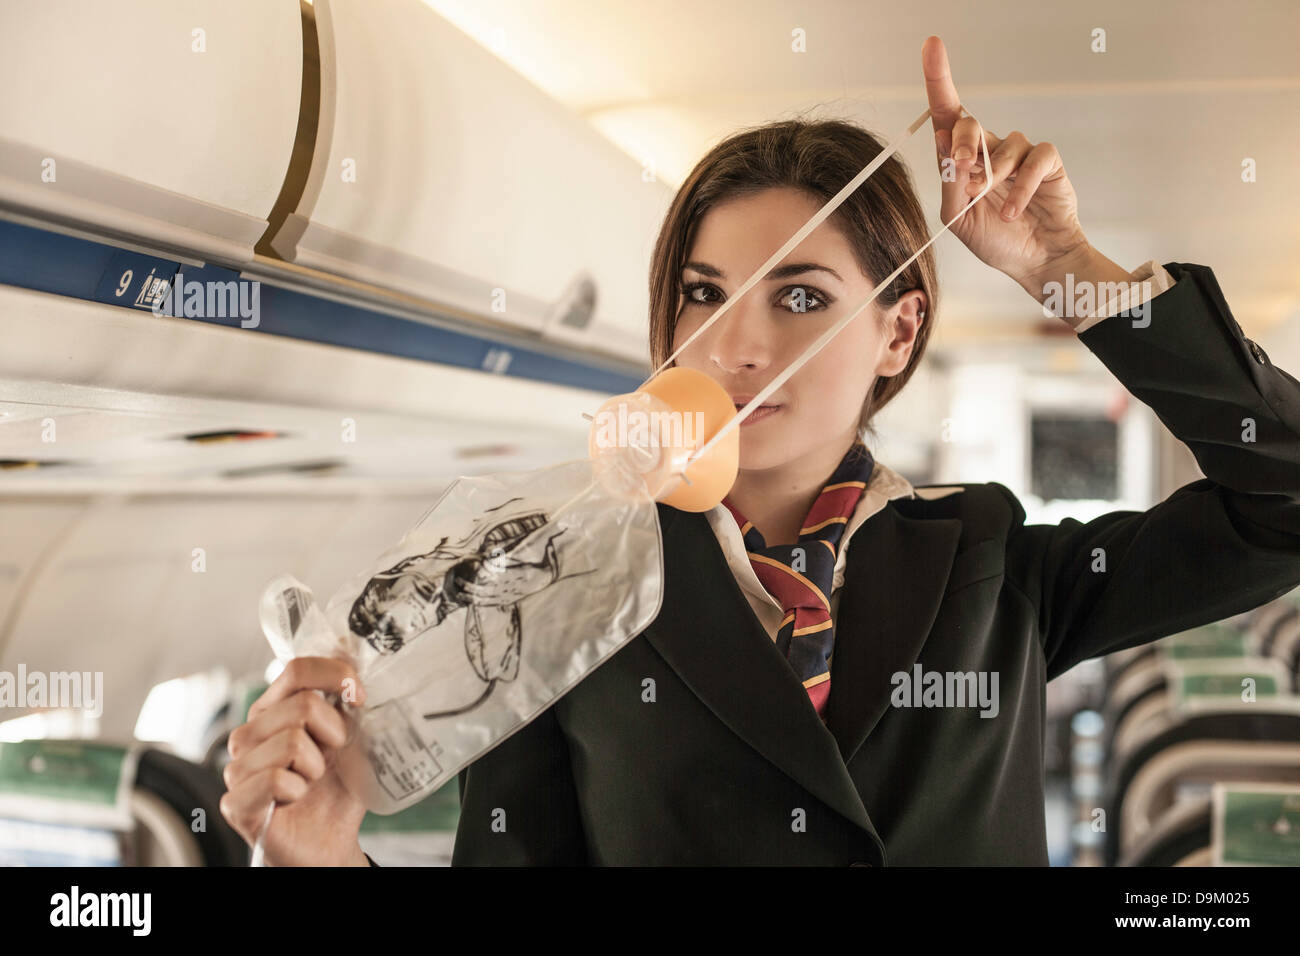 Air stewardess performing safety demonstration on aeroplane - Stock Image